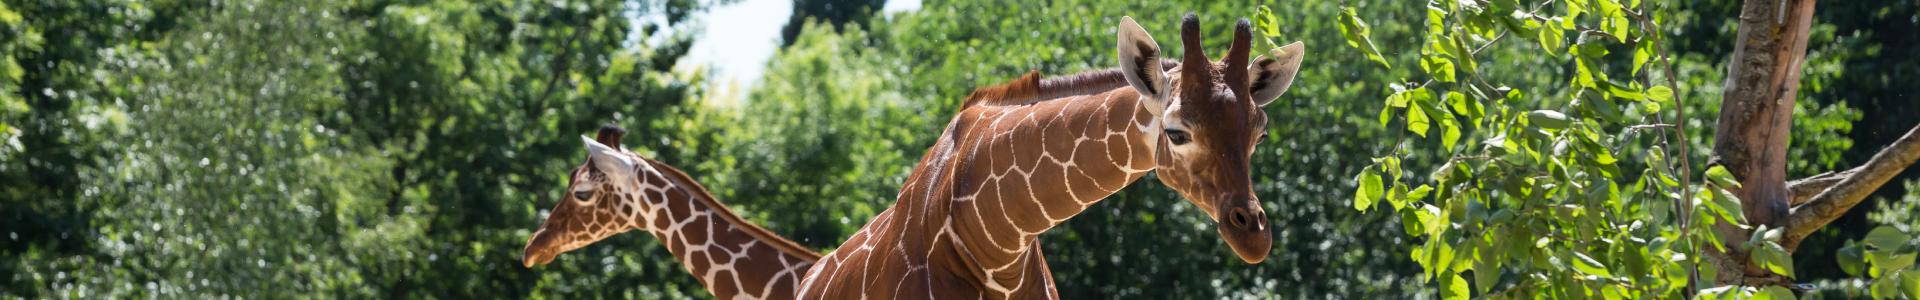 Experience - Giraffe